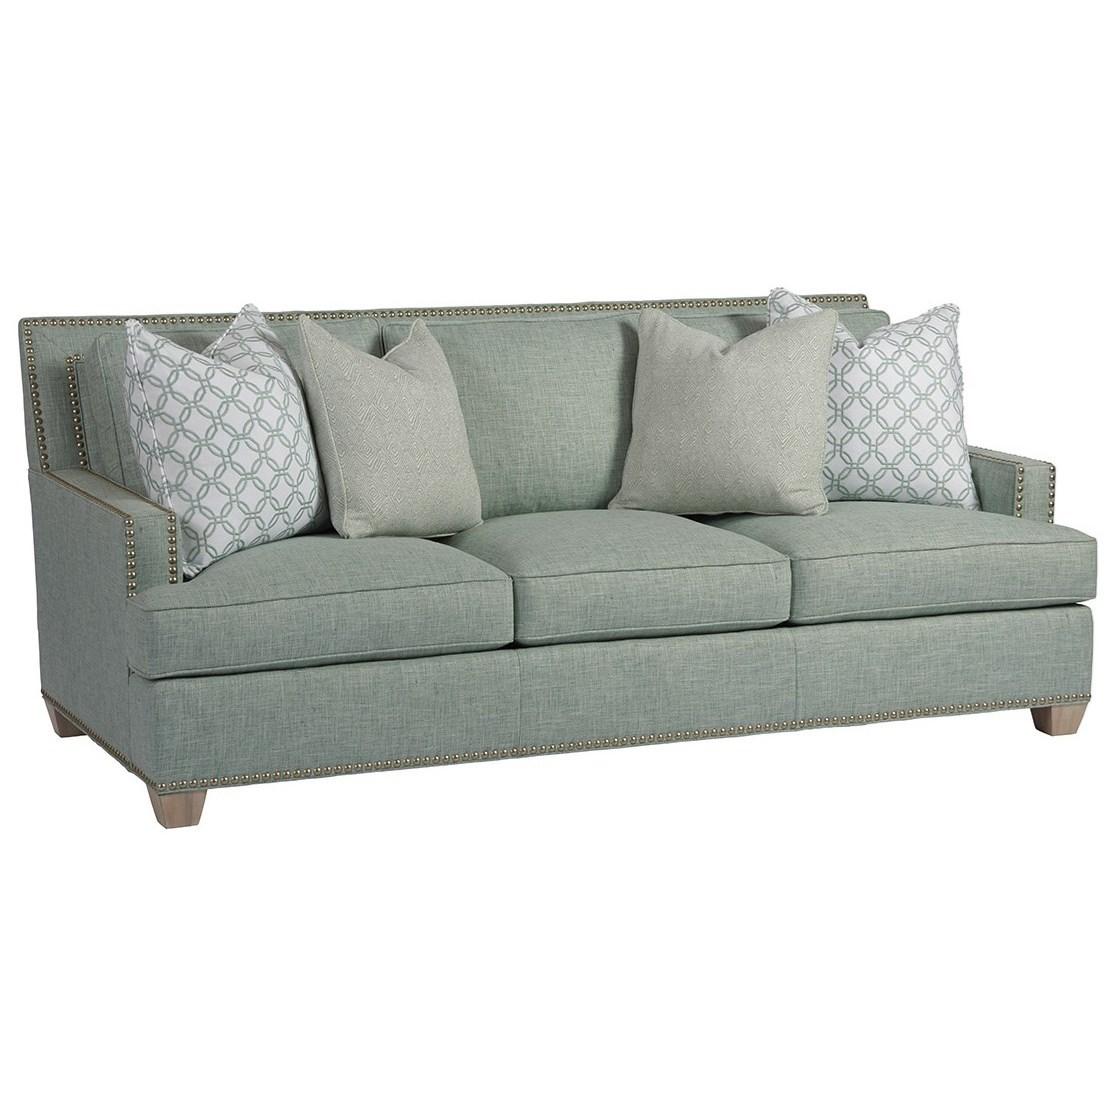 Barclay Butera Upholstery Morgan Sofa by Barclay Butera at Johnny Janosik